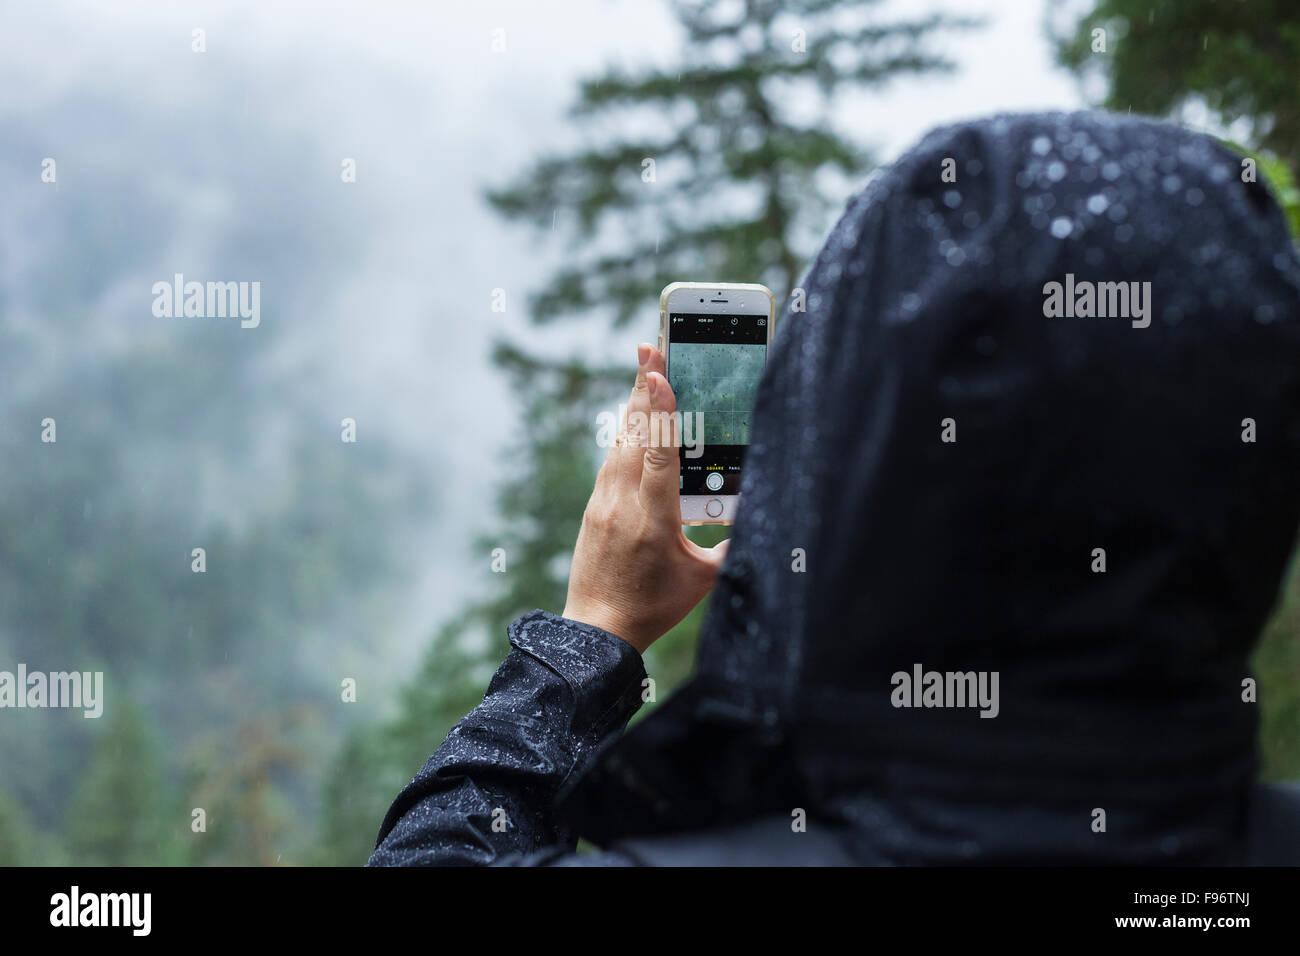 Frau Foto, im Regen, BC, Kanada Stockfoto